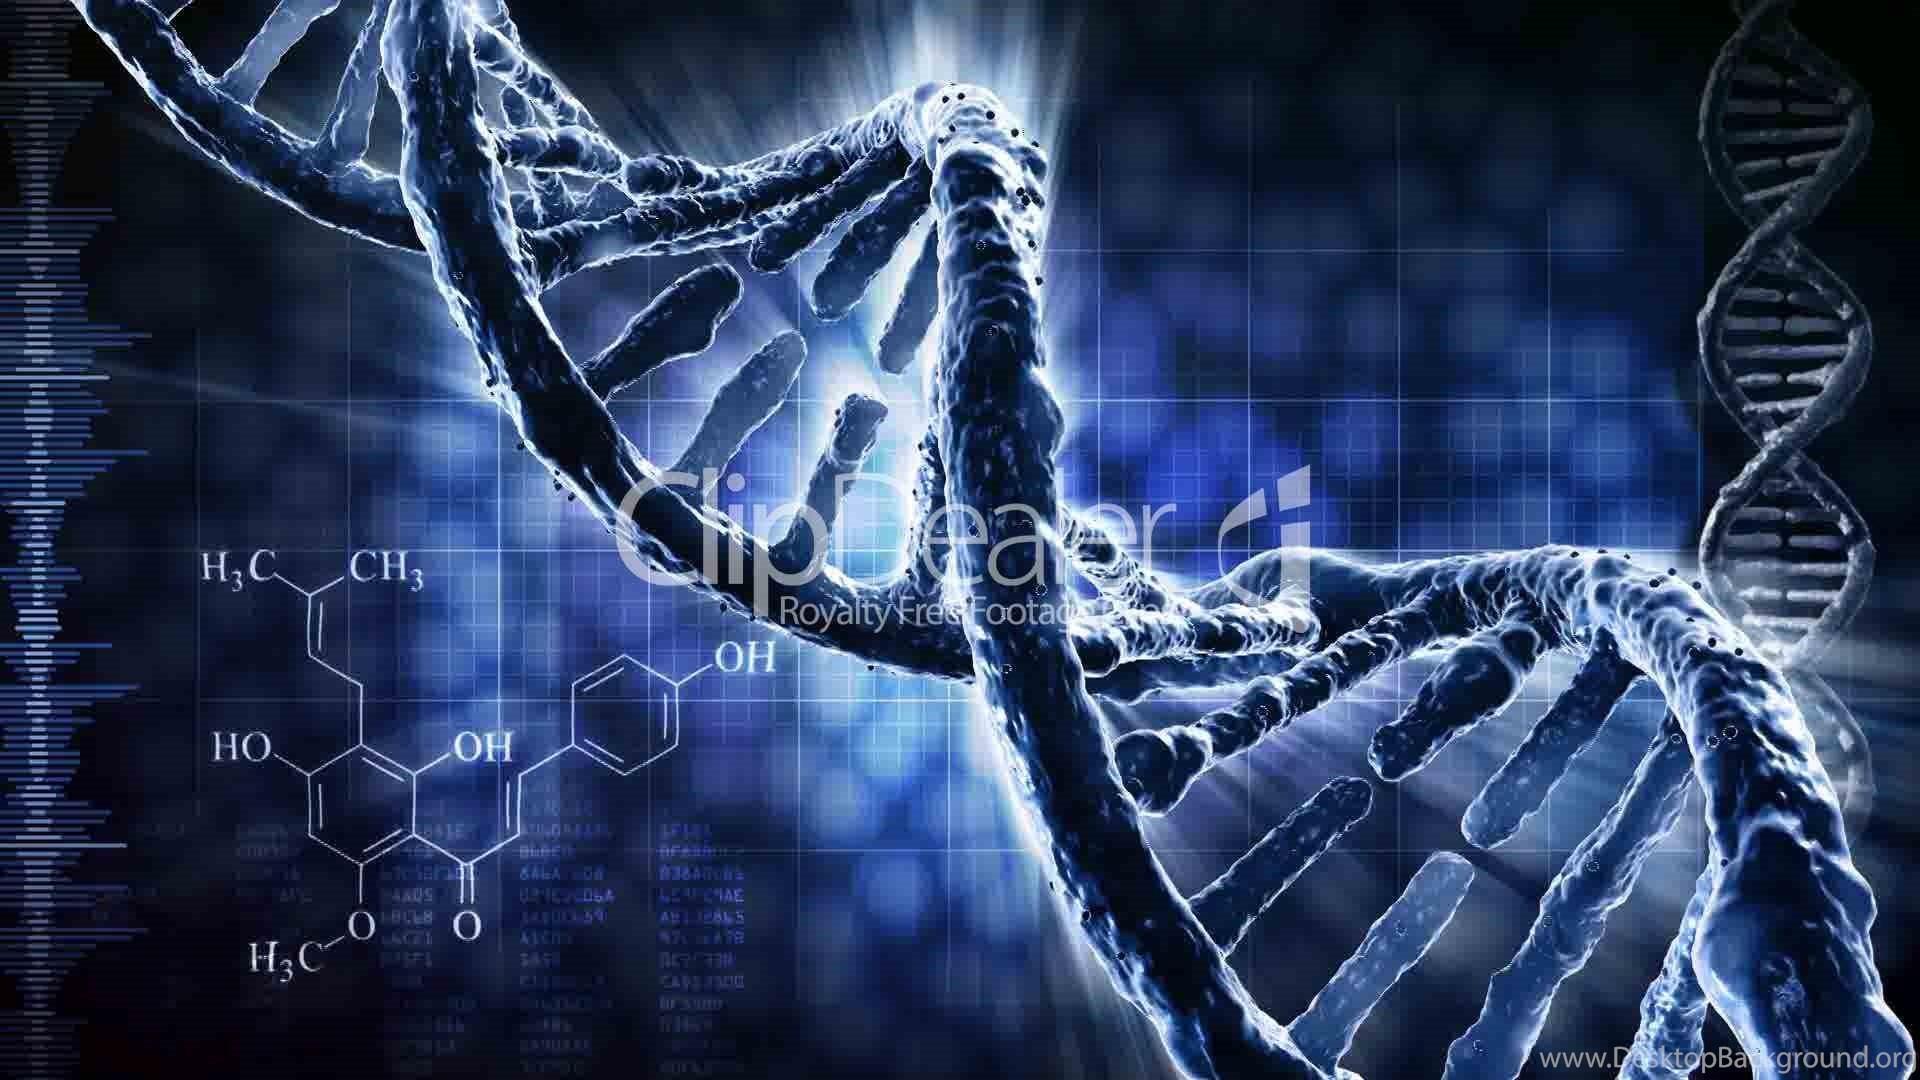 scientific download full size im - HD1920×1080